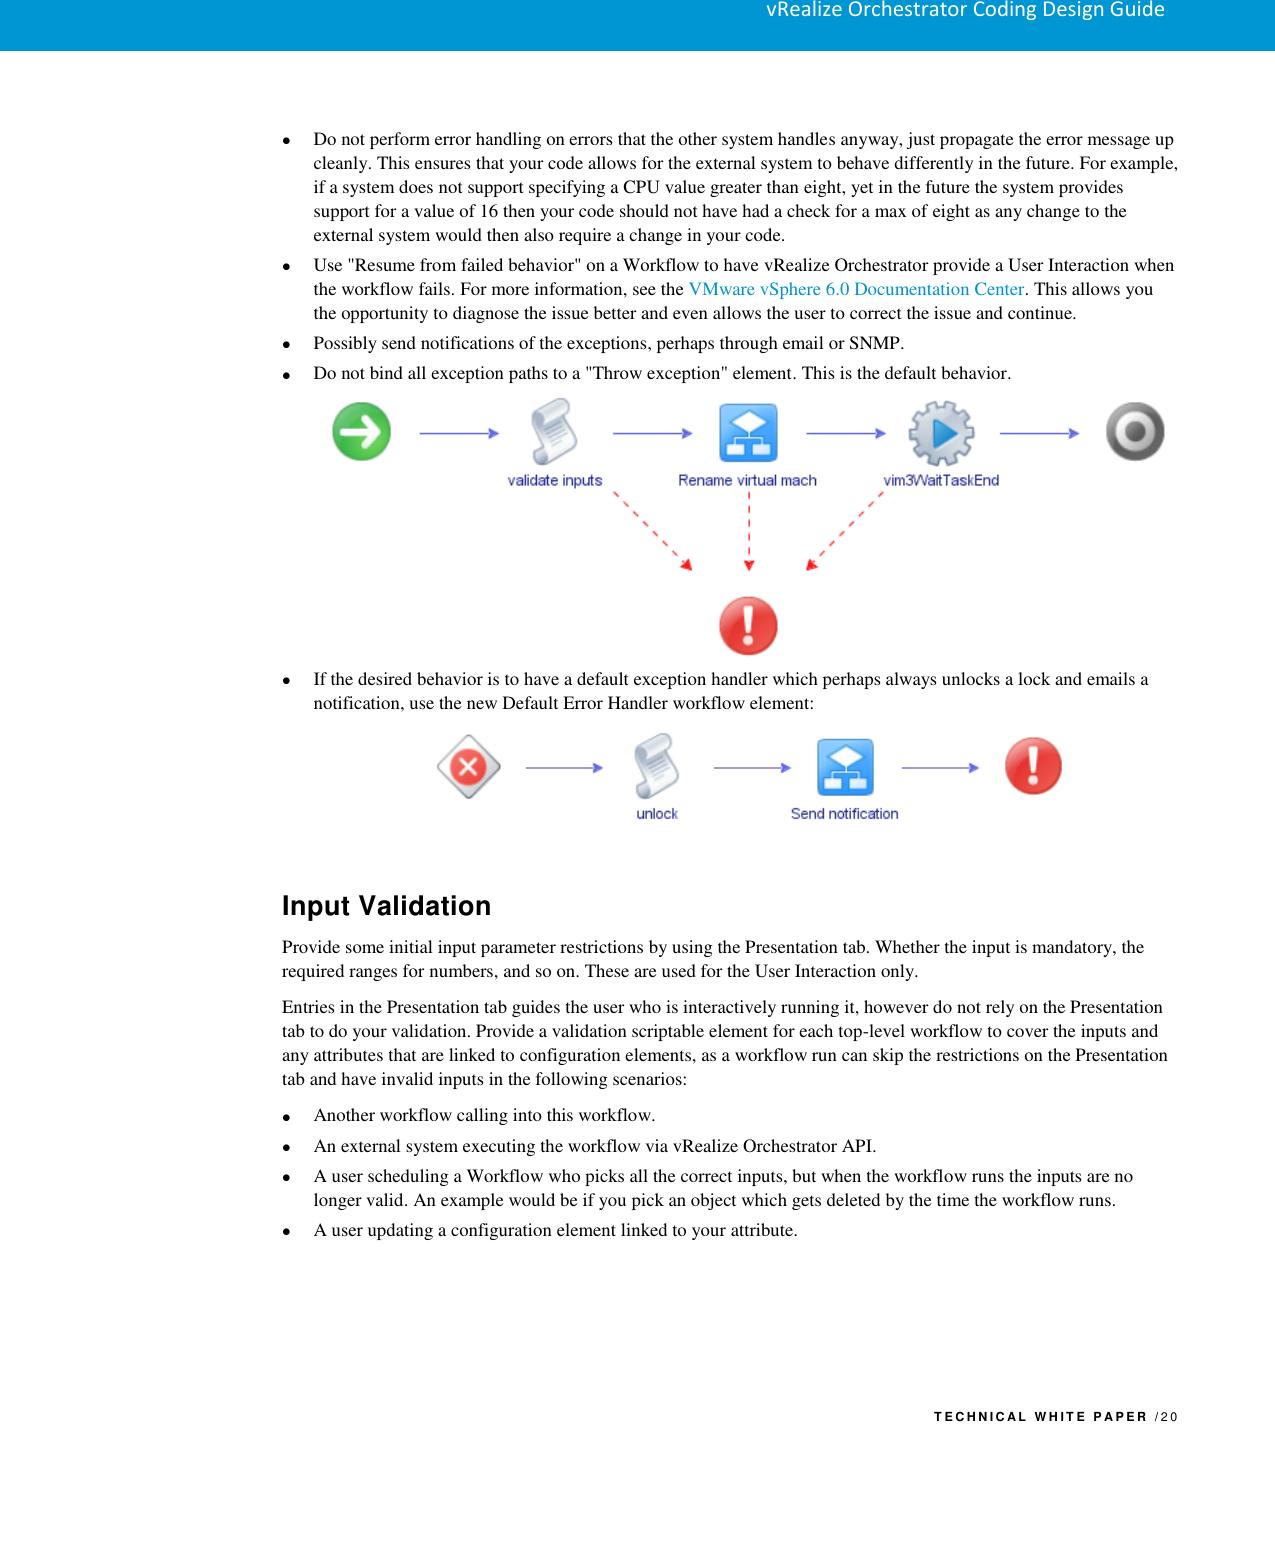 Vmware VRO Coding Design Guide V Realize Orchestrator Vrealize Cdg